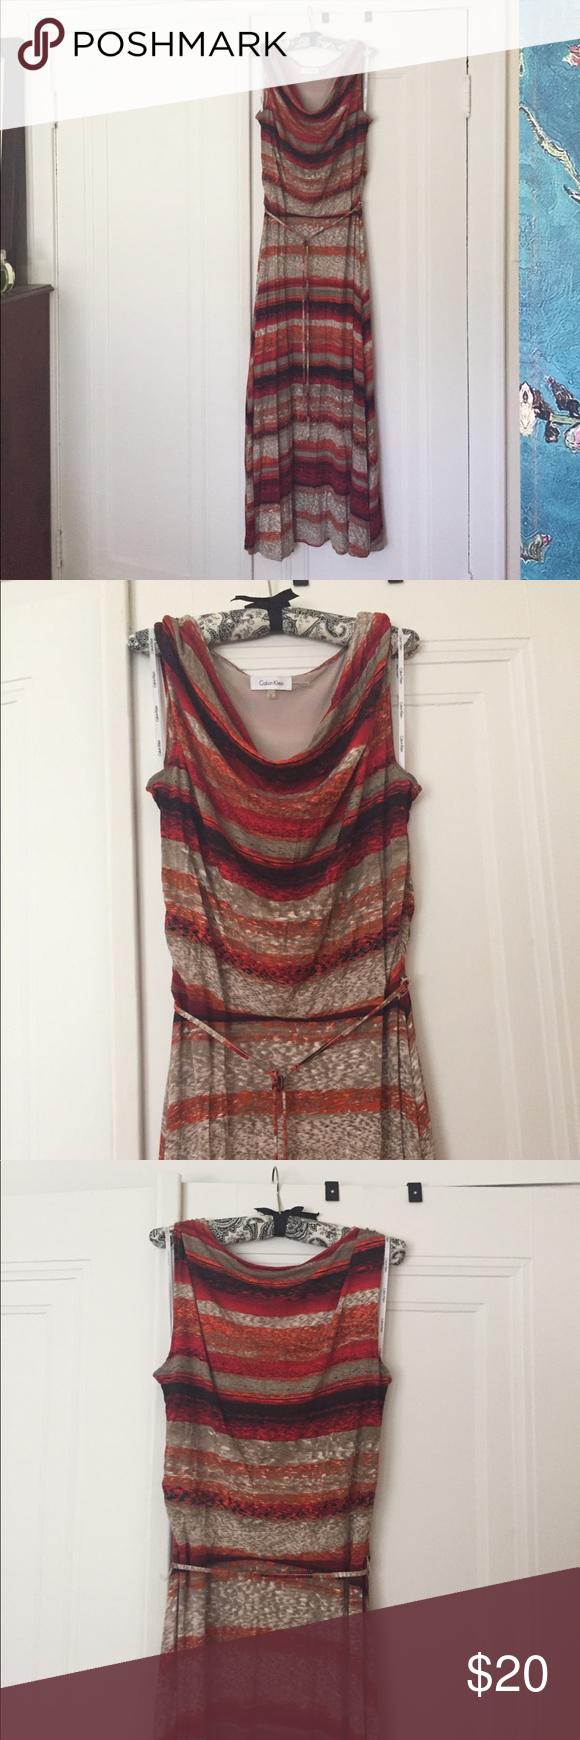 Calvin Klein maxi dress, size medium Drape neck, belted CK maxi in beautiful summer stripe. Rayon. Top is lined. Calvin Klein Dresses Maxi